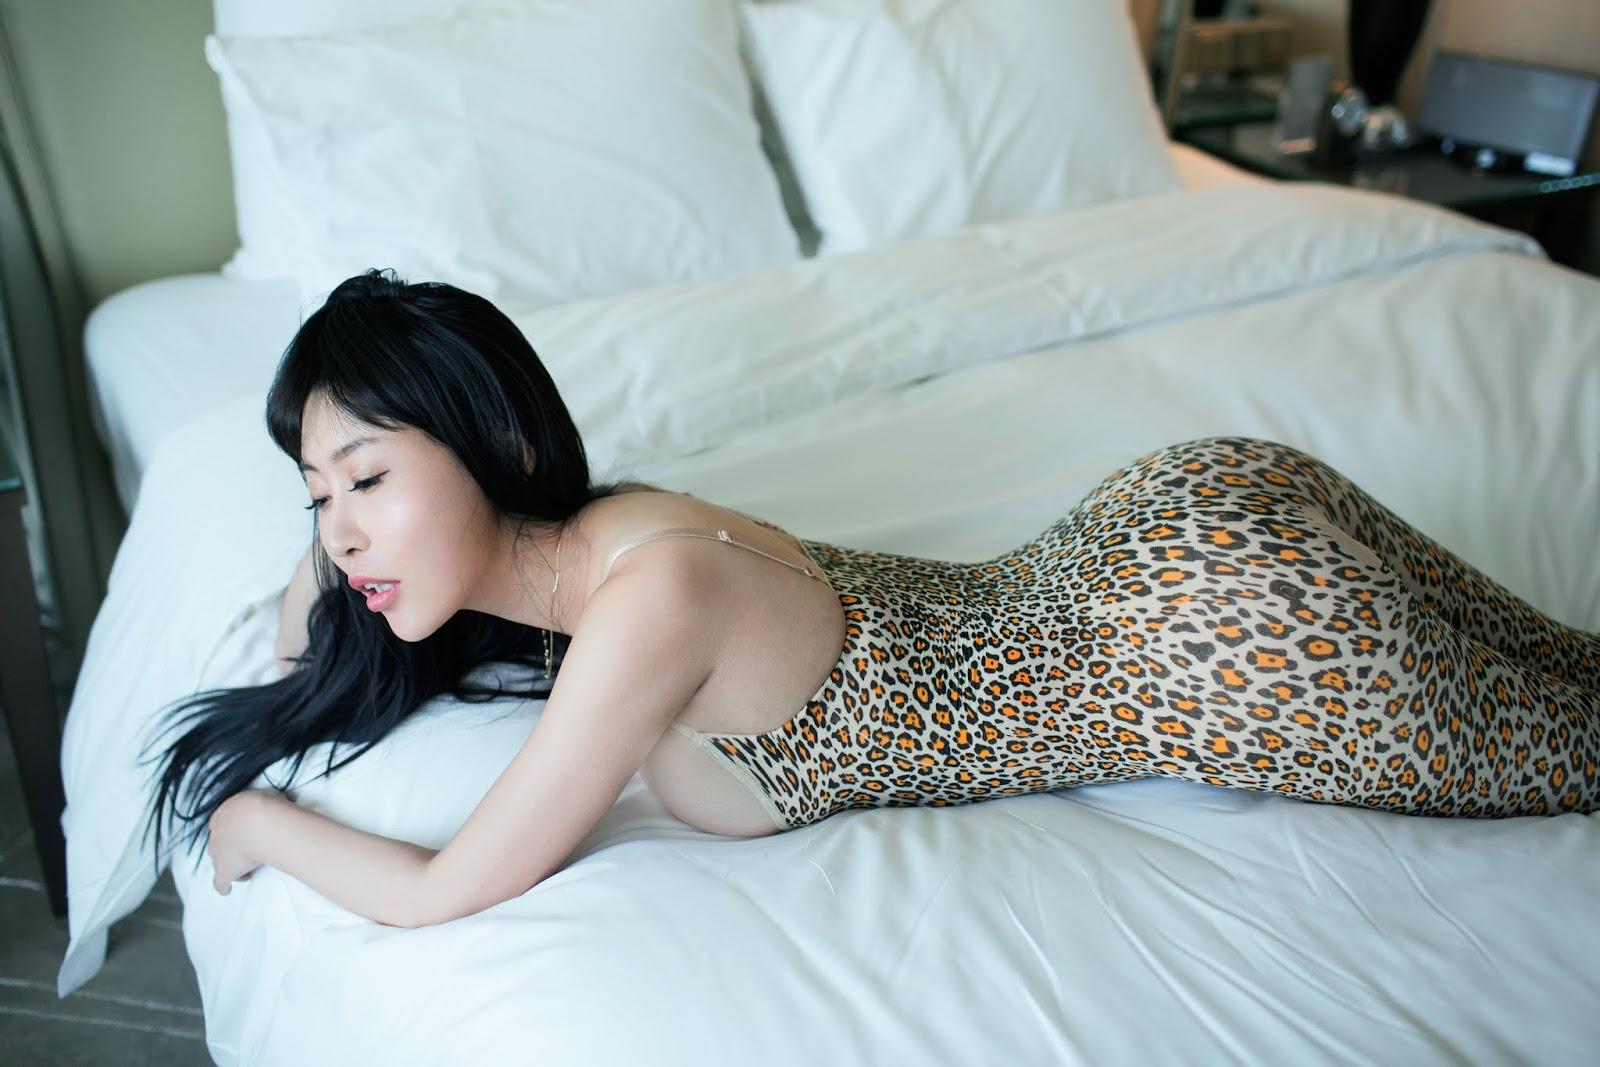 Rita 07 - Hot Model Sexy TUIGIRL NO.50 Naked